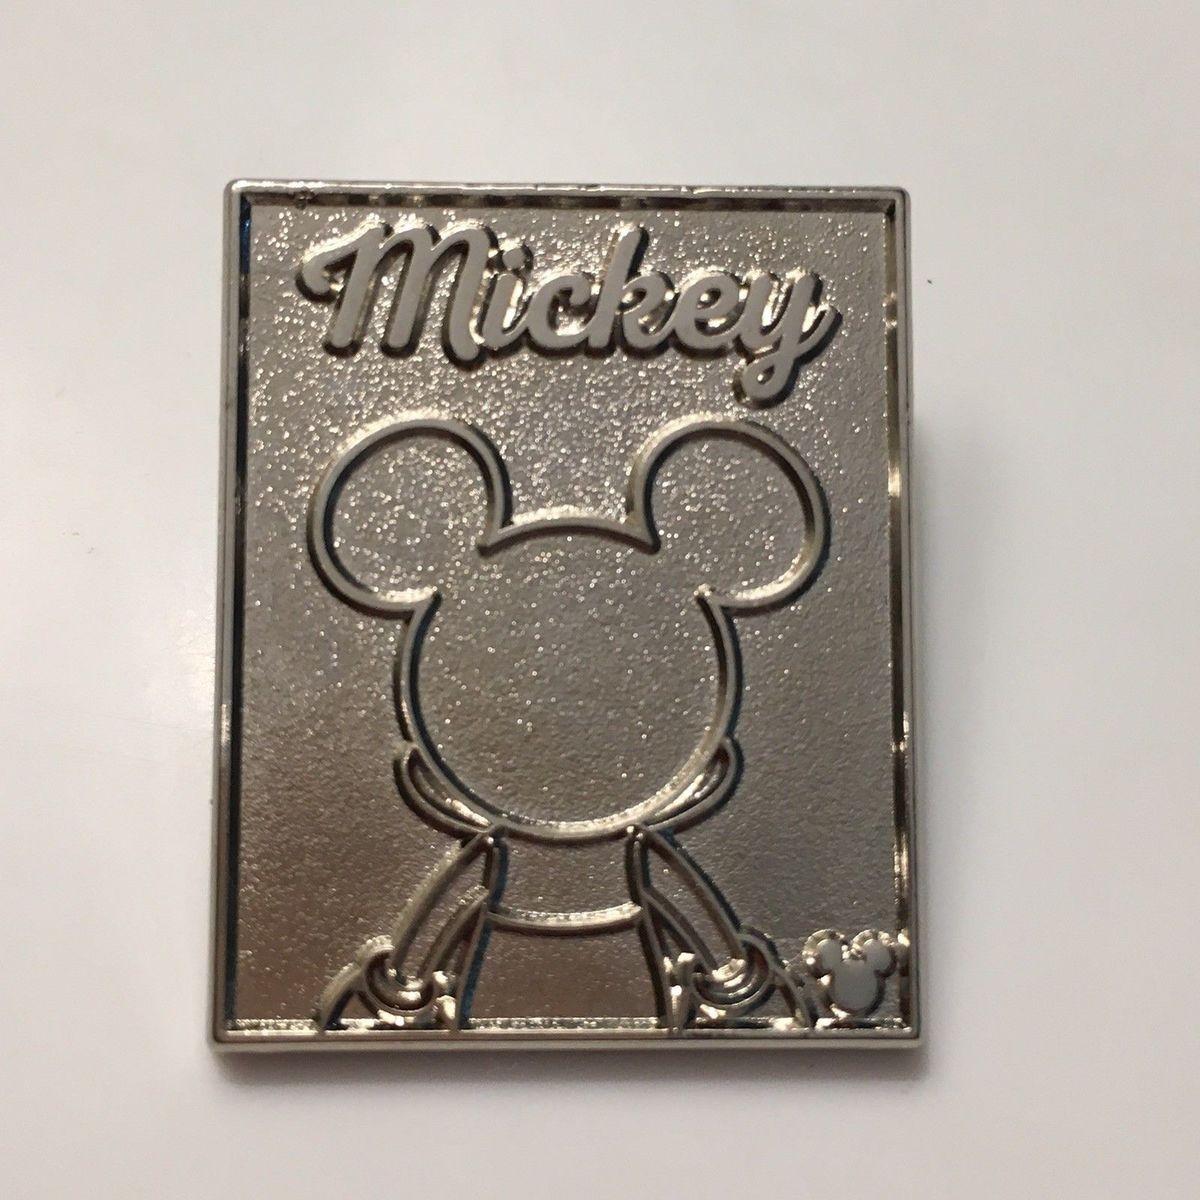 2018 DLR Hidden Mickey Back Silhouette Pluto Disney Pin